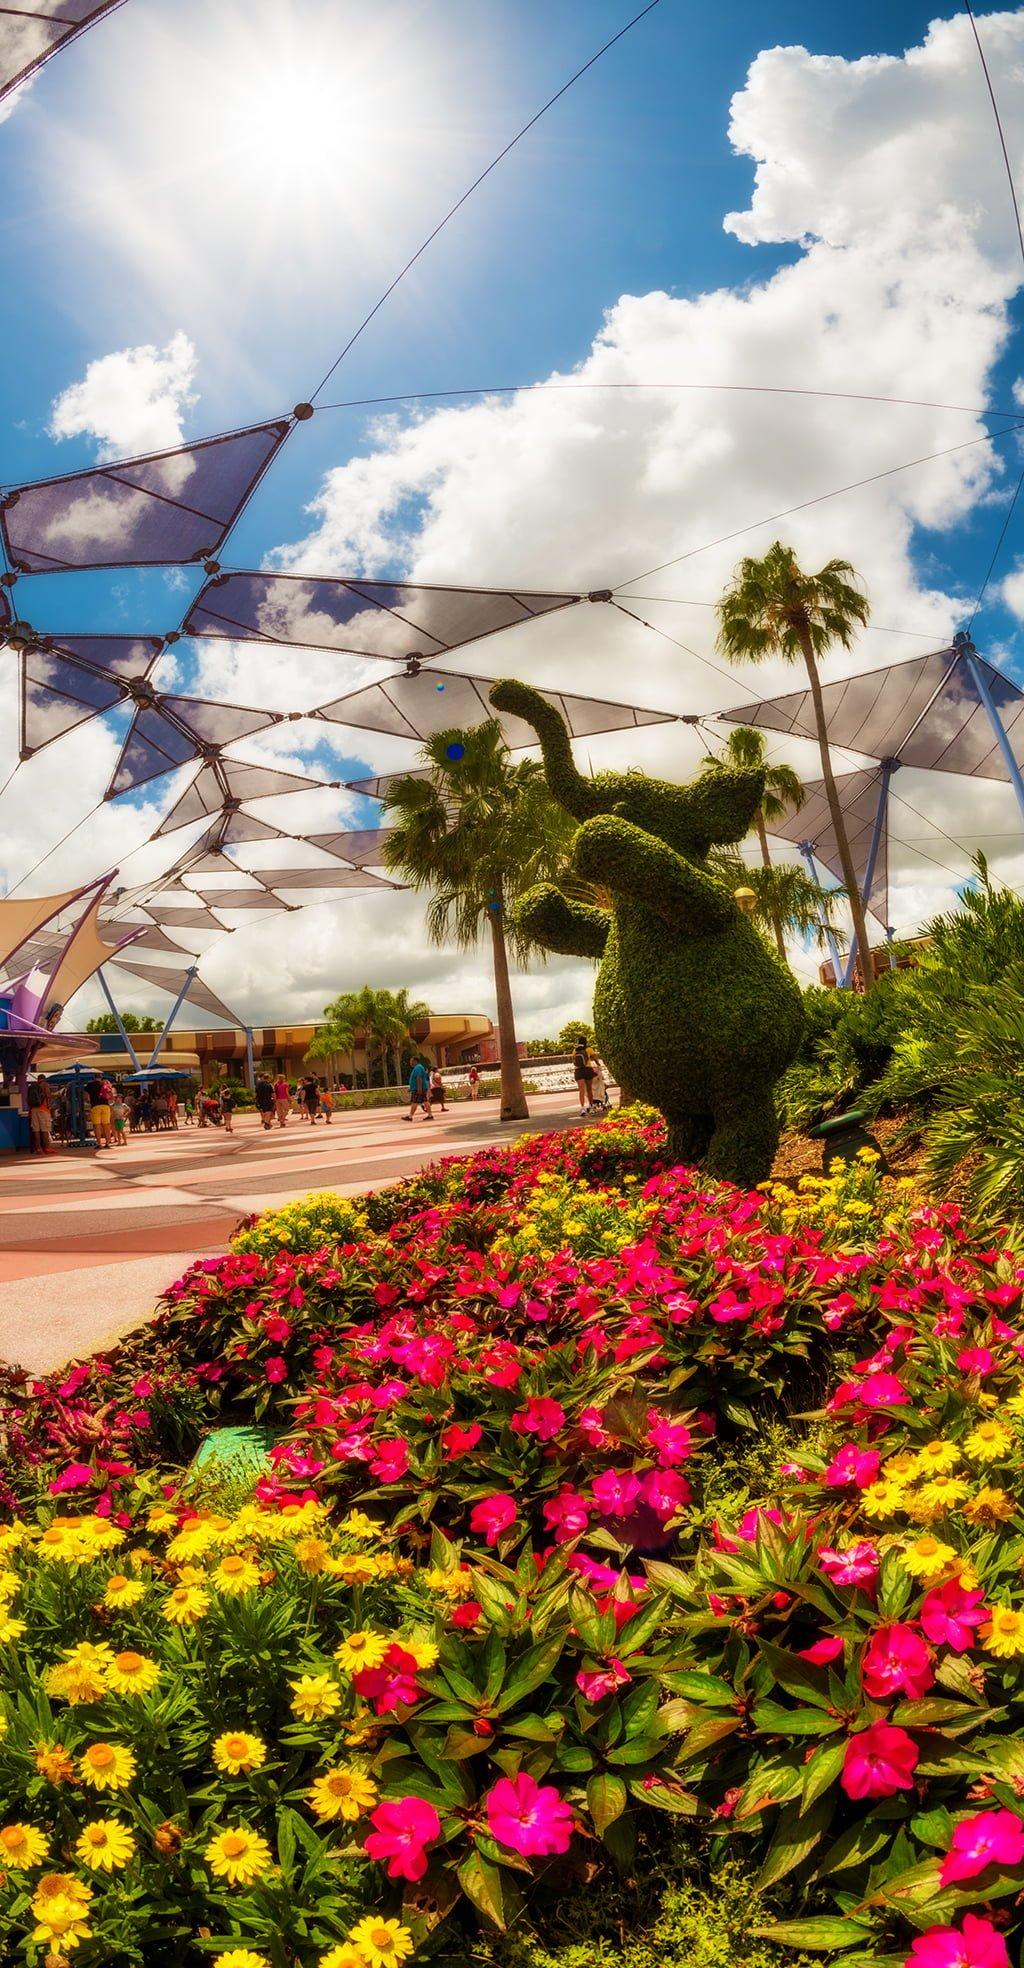 April 2018 at walt disney world disney tourist blog for Disney flower and garden festival